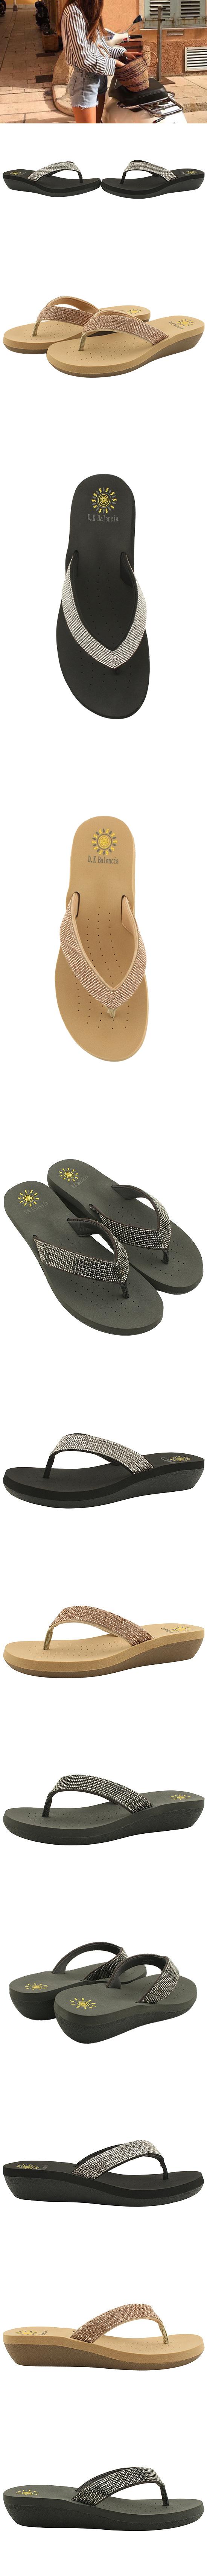 Soft Cushioning Flip-Flop Slippers Beige